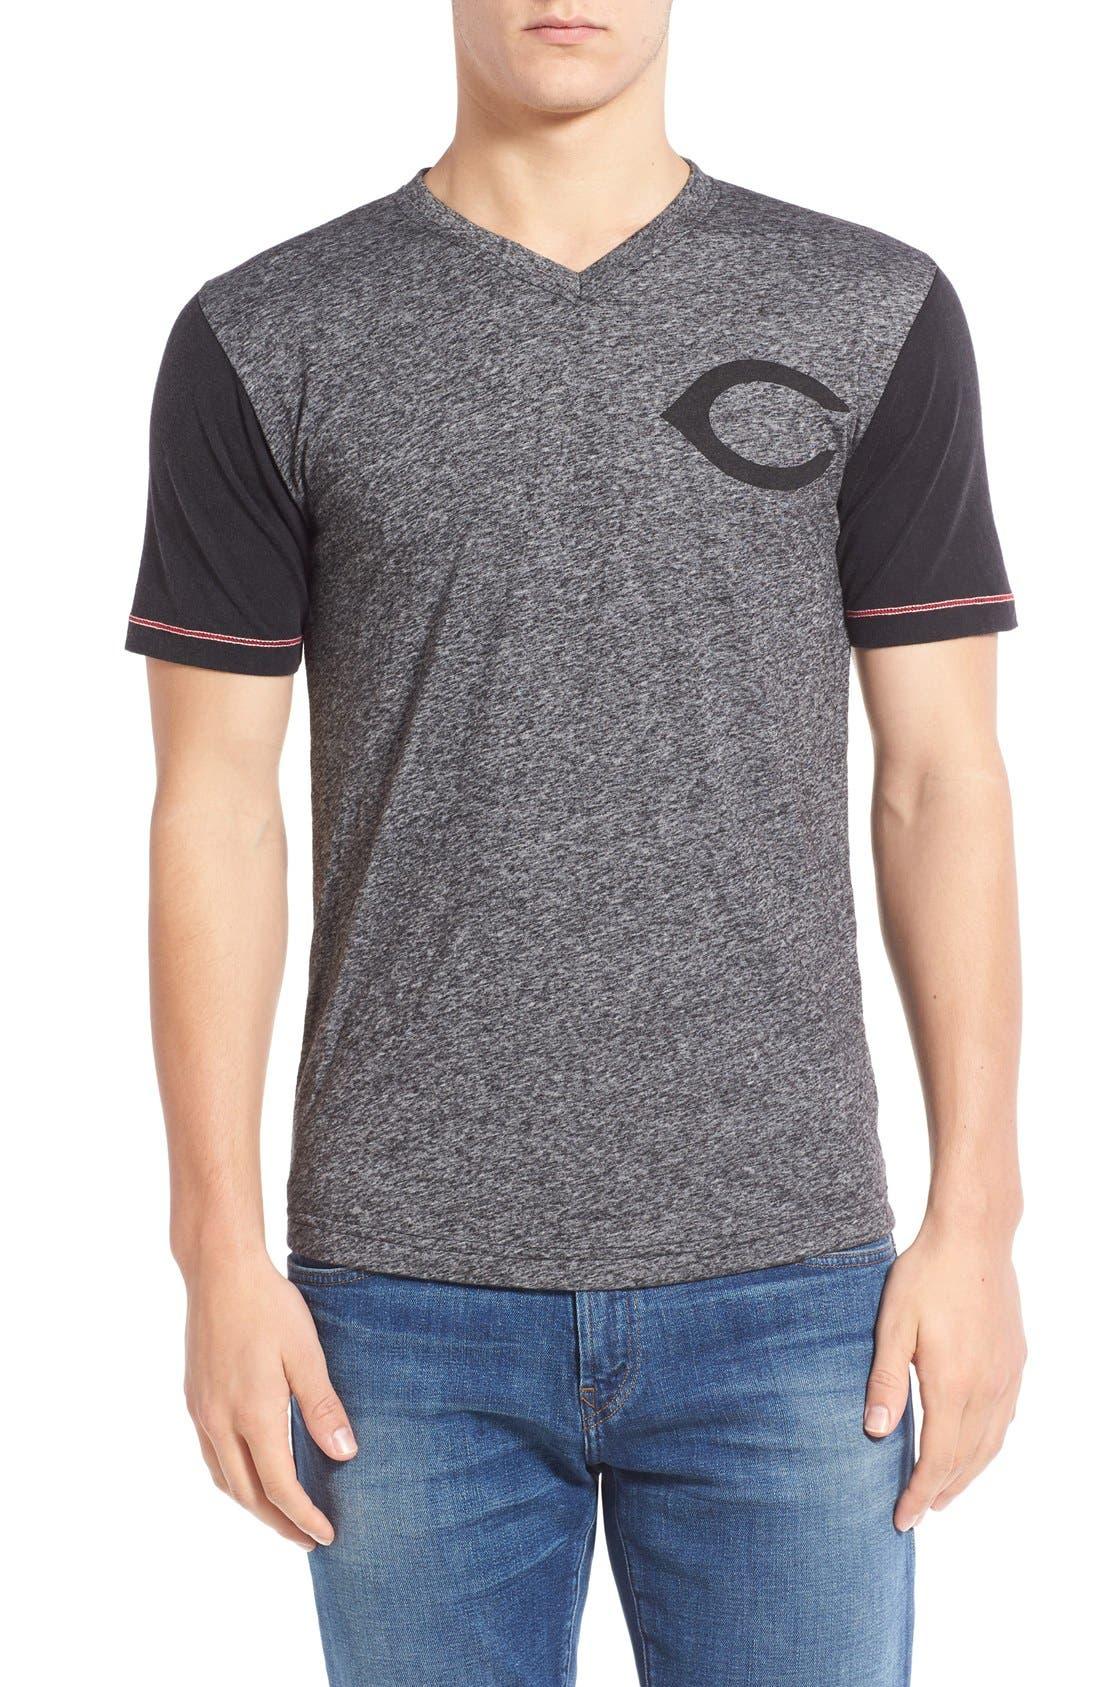 'Cincinnati Reds - Onyx' Trim Fit V-Neck T-Shirt,                         Main,                         color, Charcoal-Black